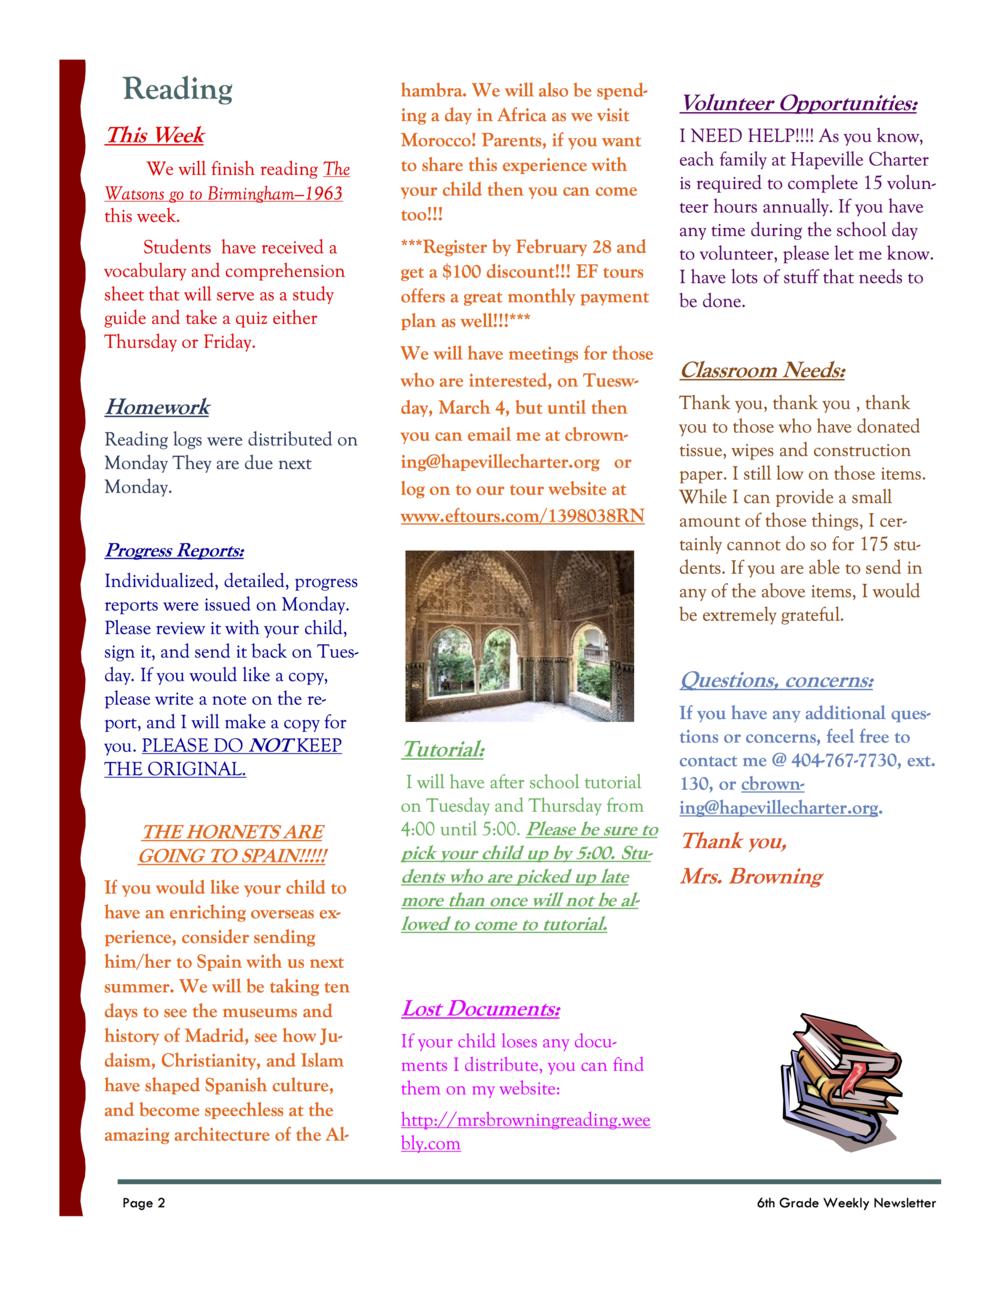 6th grade February 24-28B.png